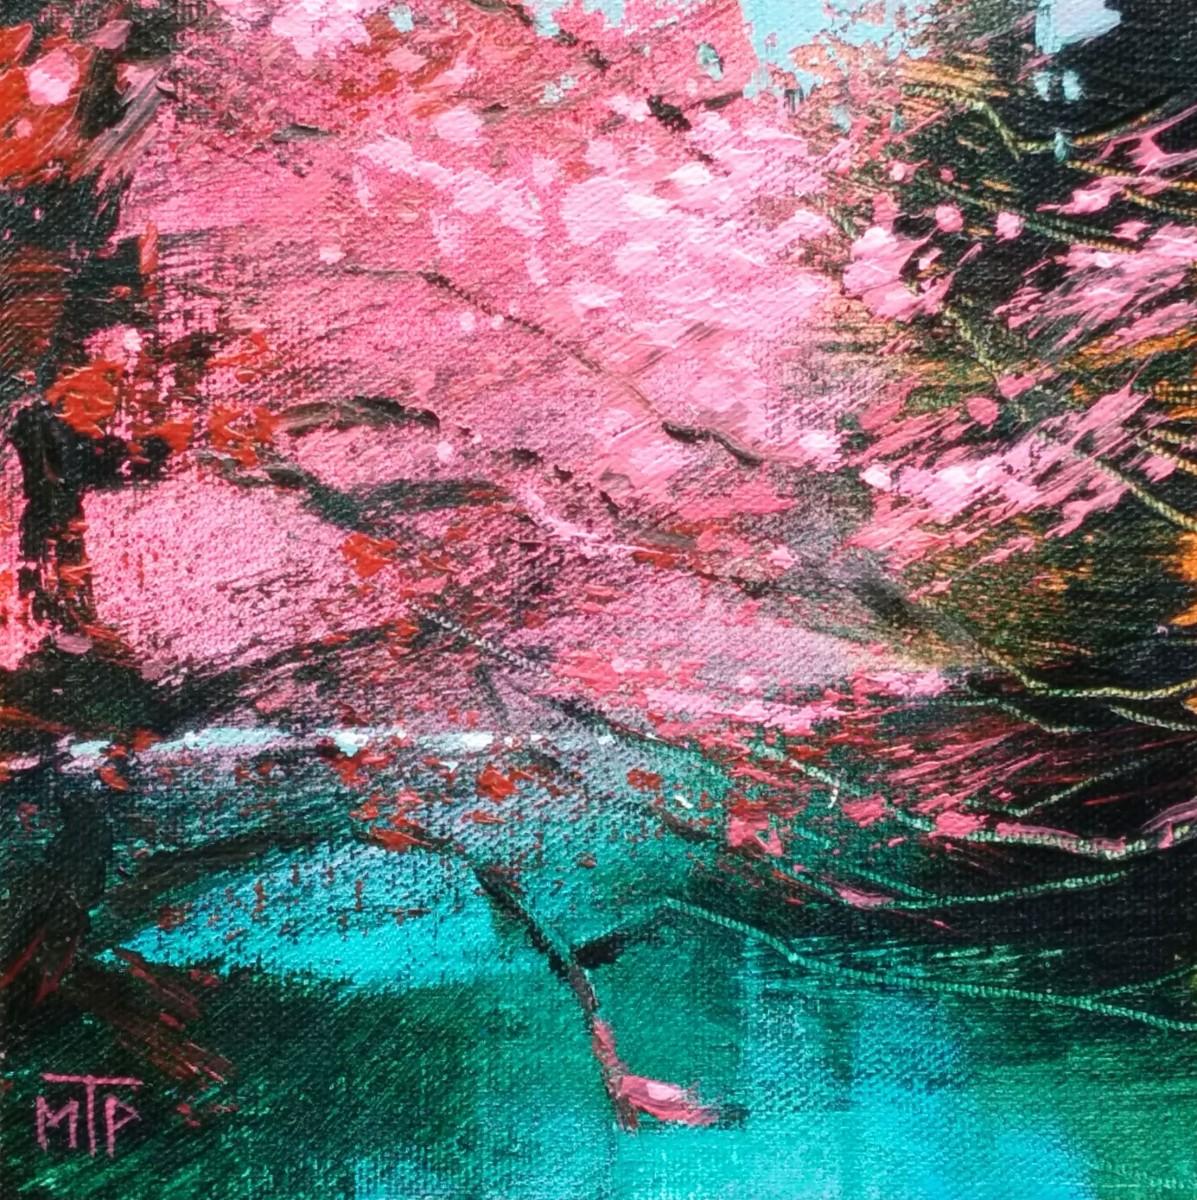 Cherry Tree by the Pond Study